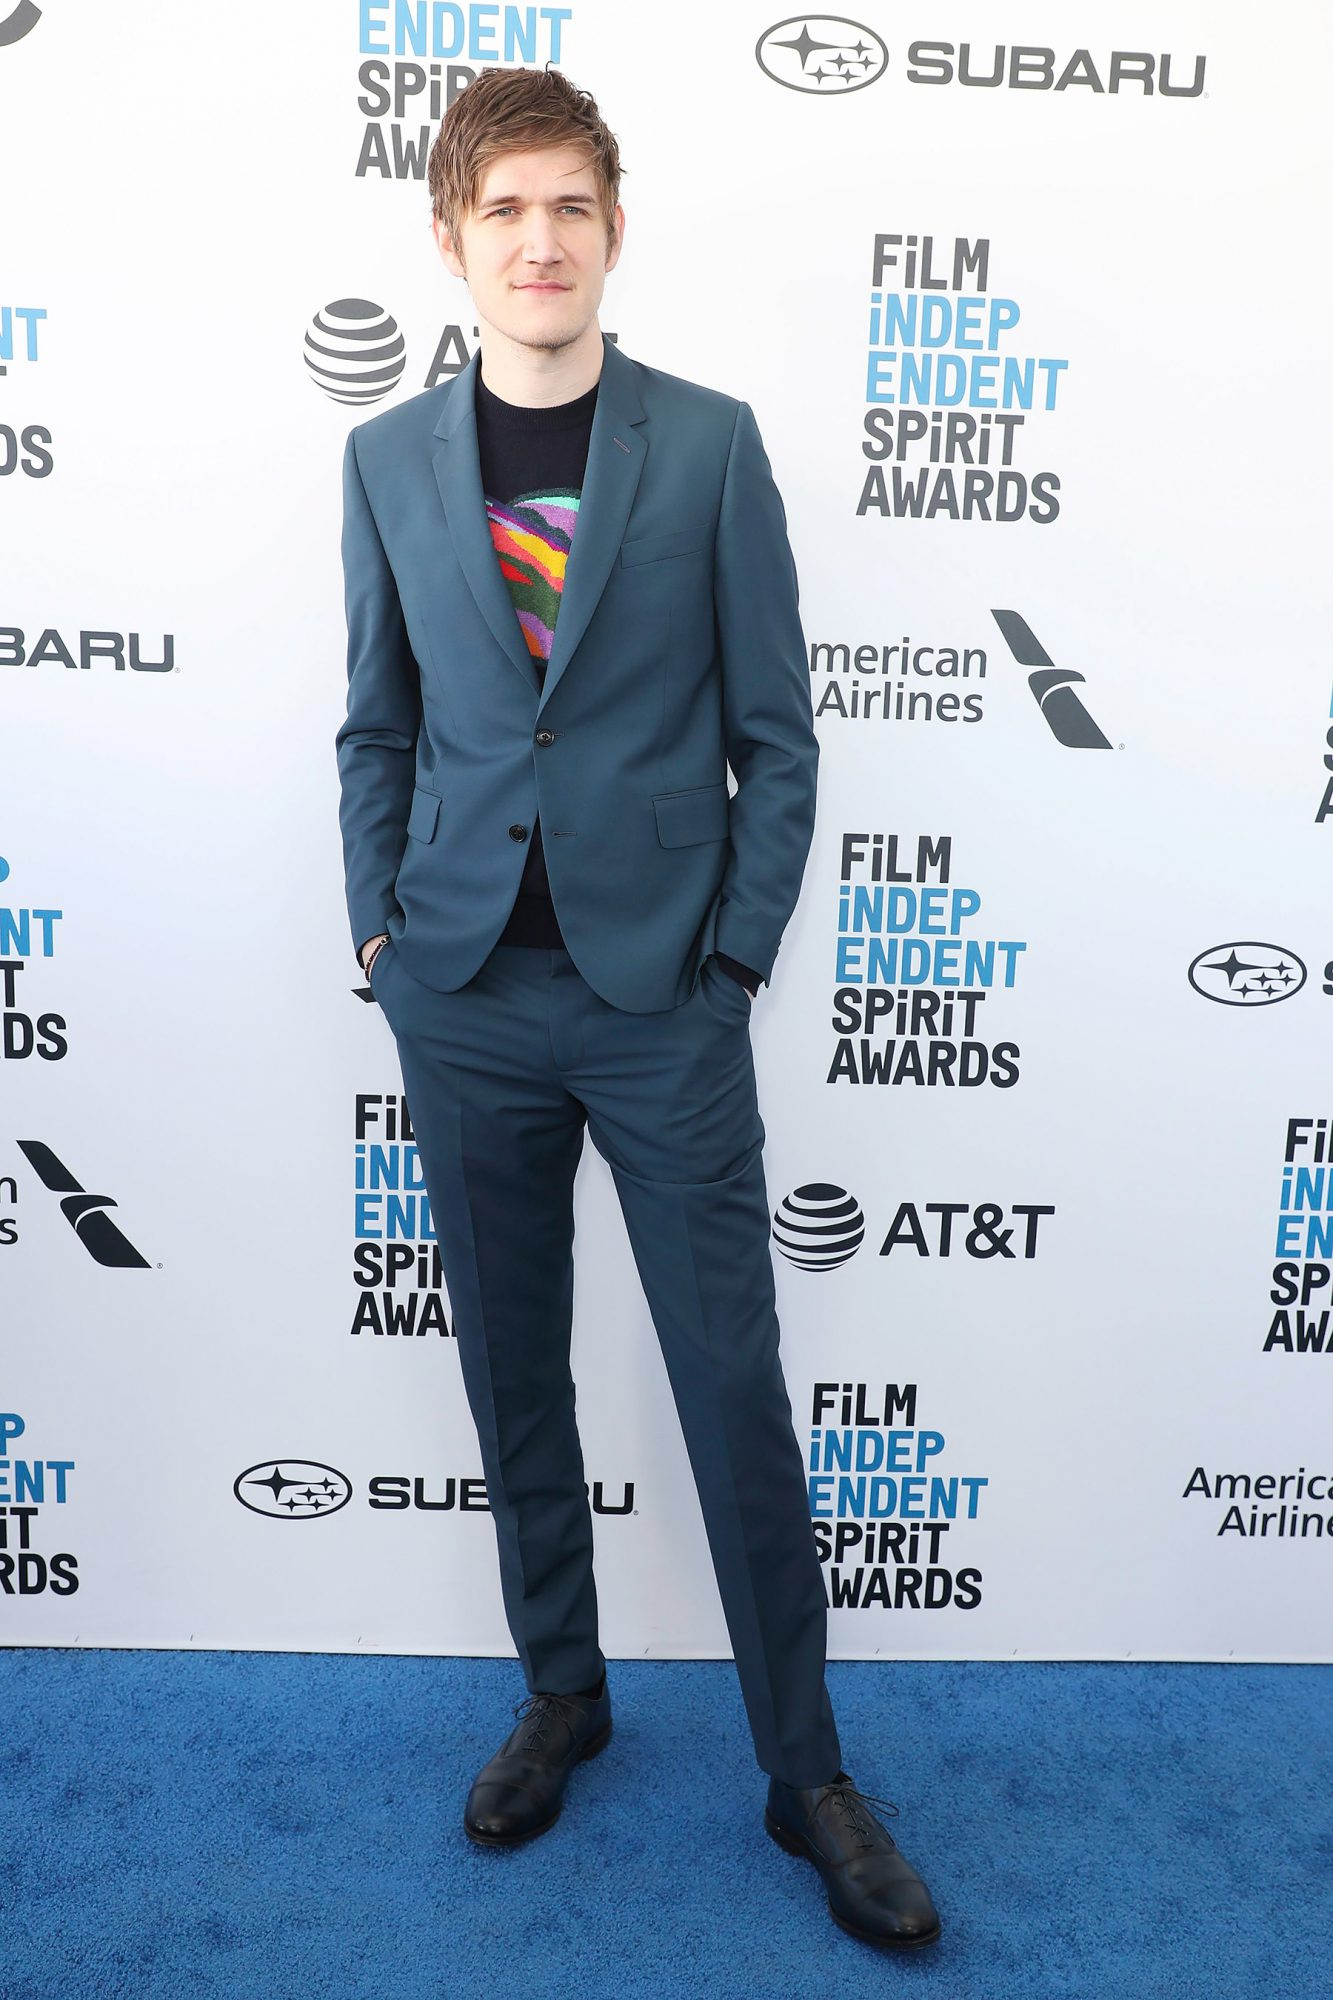 34th Film Independent Spirit Awards, Roaming Arrivals, Los Angeles, USA - 23 Feb 2019